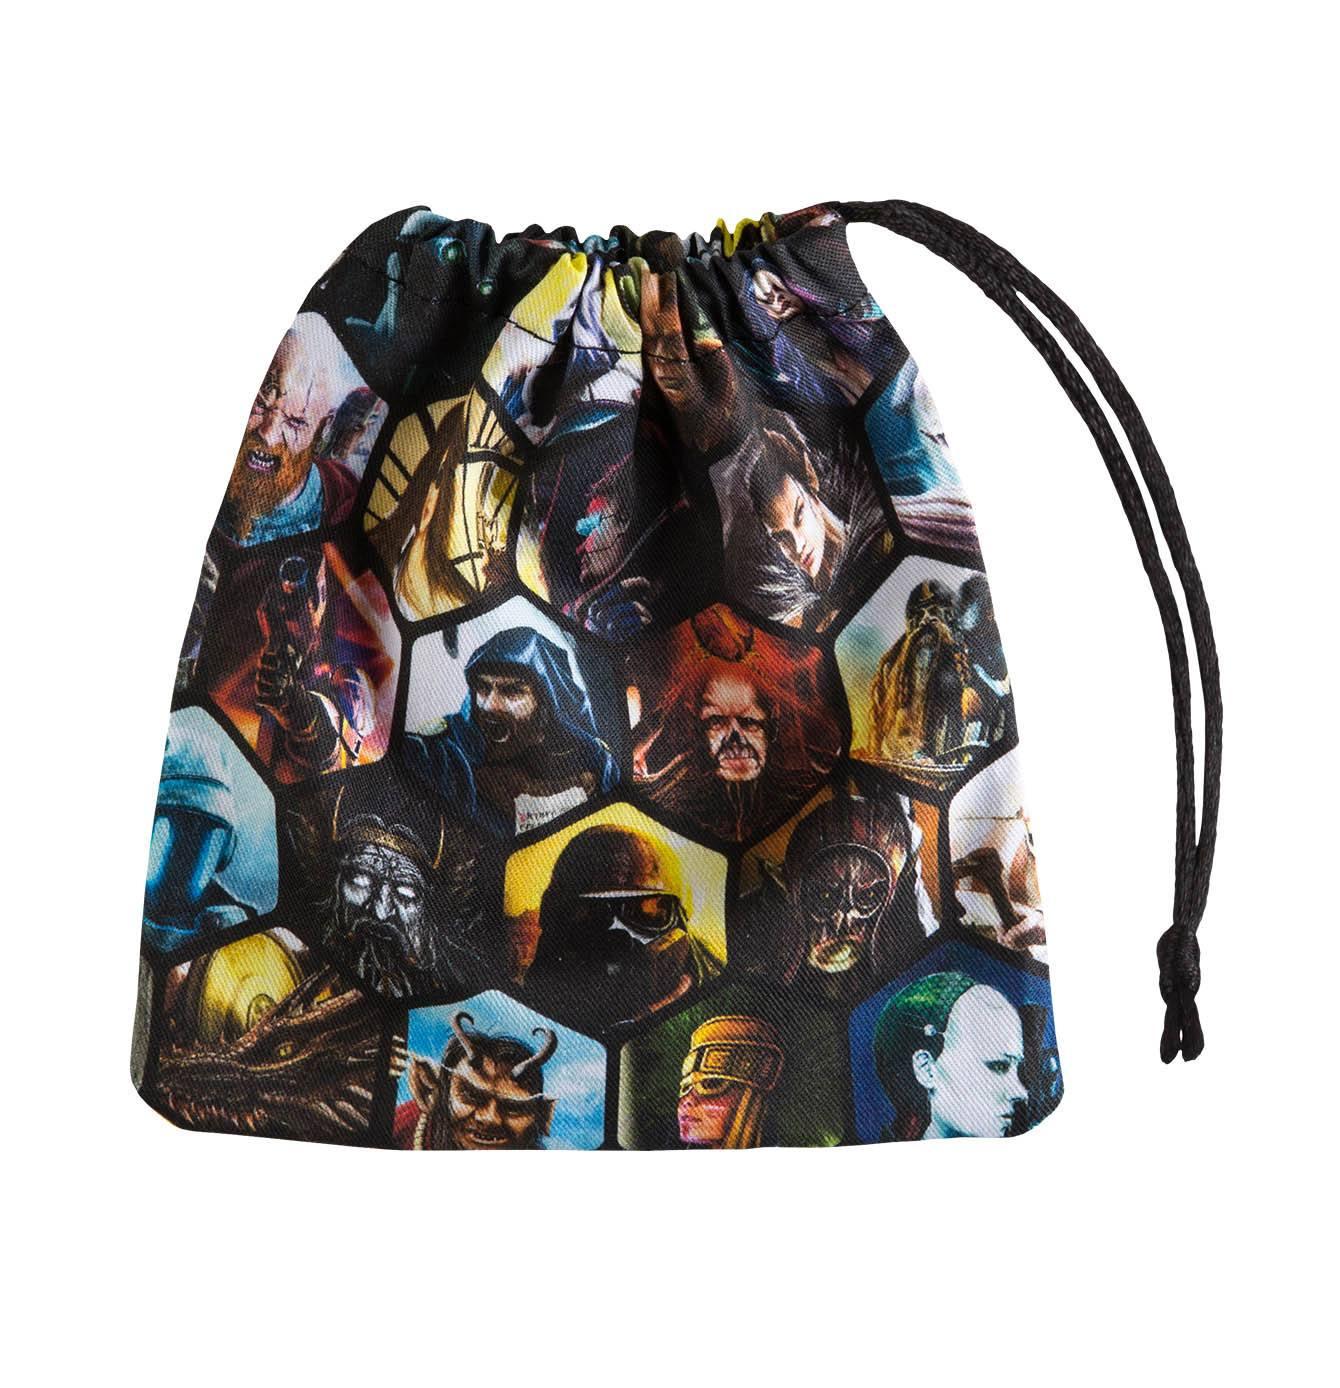 Branded Dice Bag Fullprint